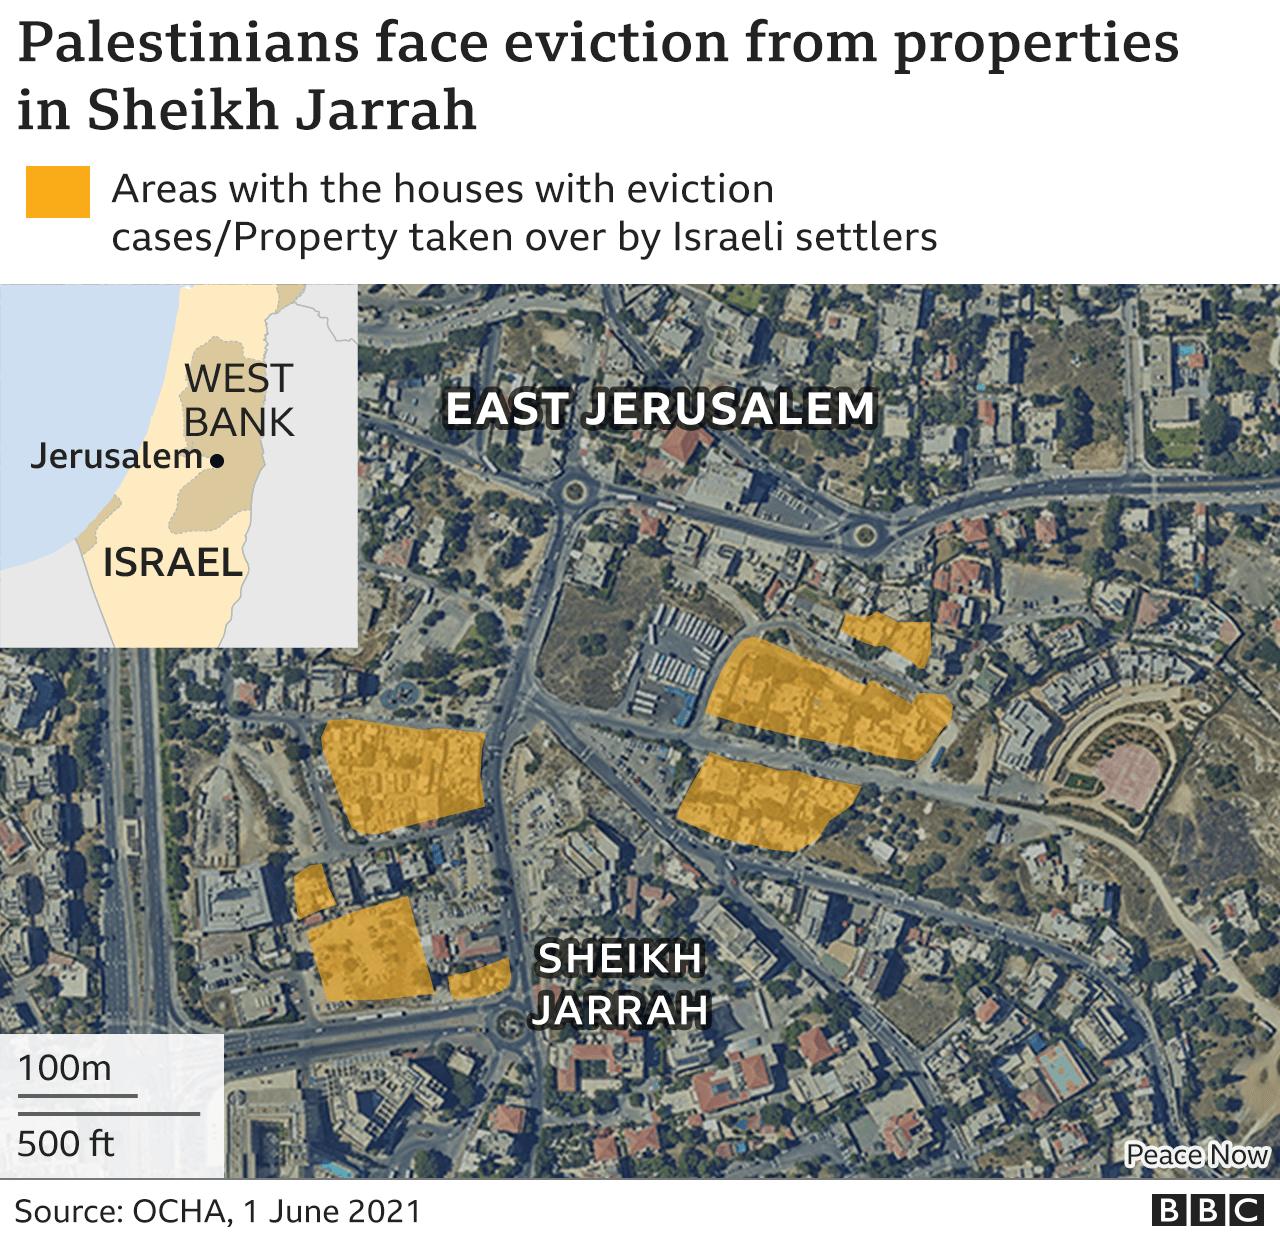 Satellite map of Sheikh Jarrah in East Jerusalem indicates properties at risk of eviction.